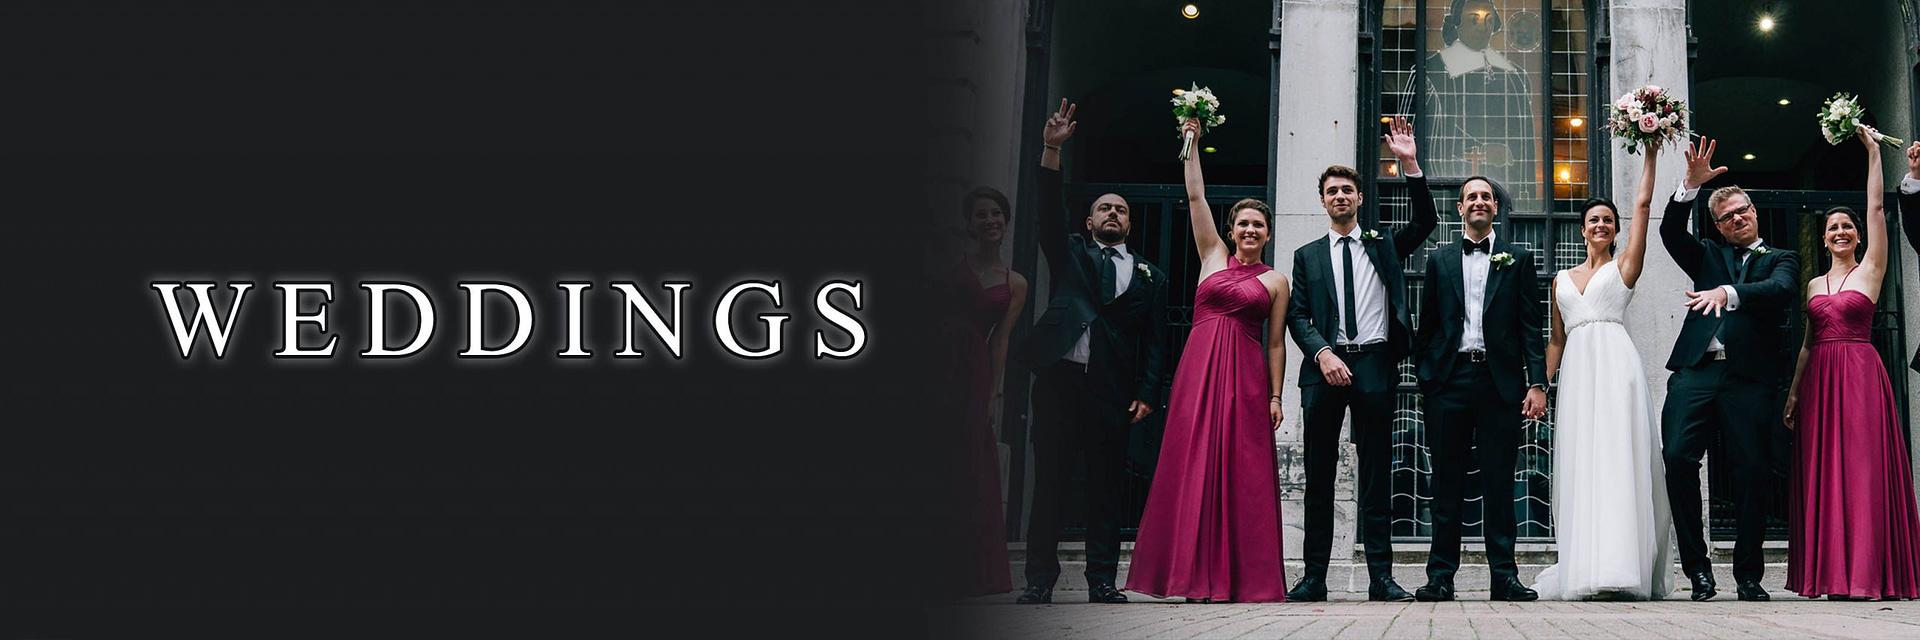 Dave WEDDINGS